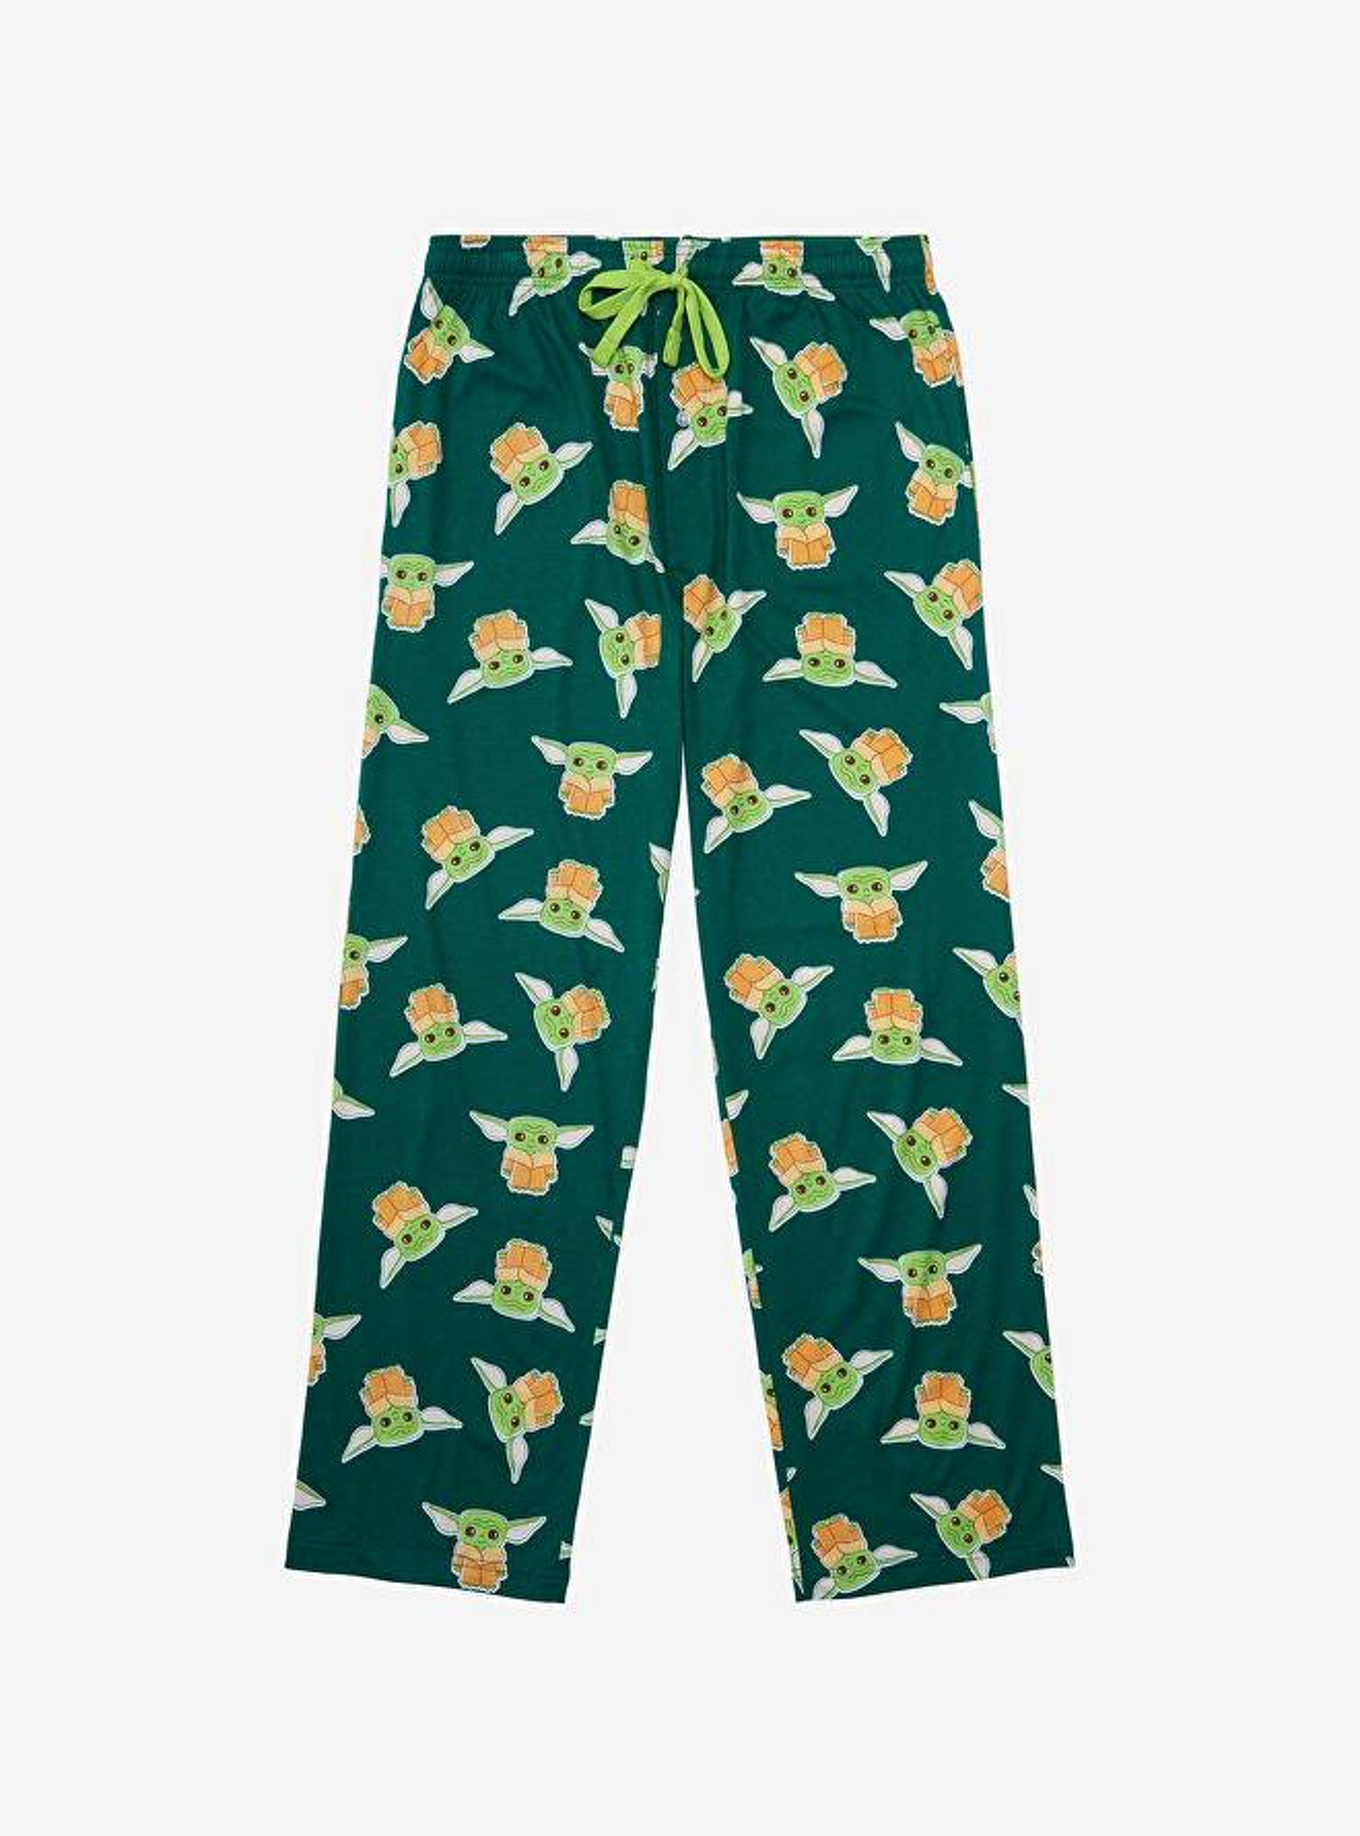 baby-yoda-sleep-pants.jpg